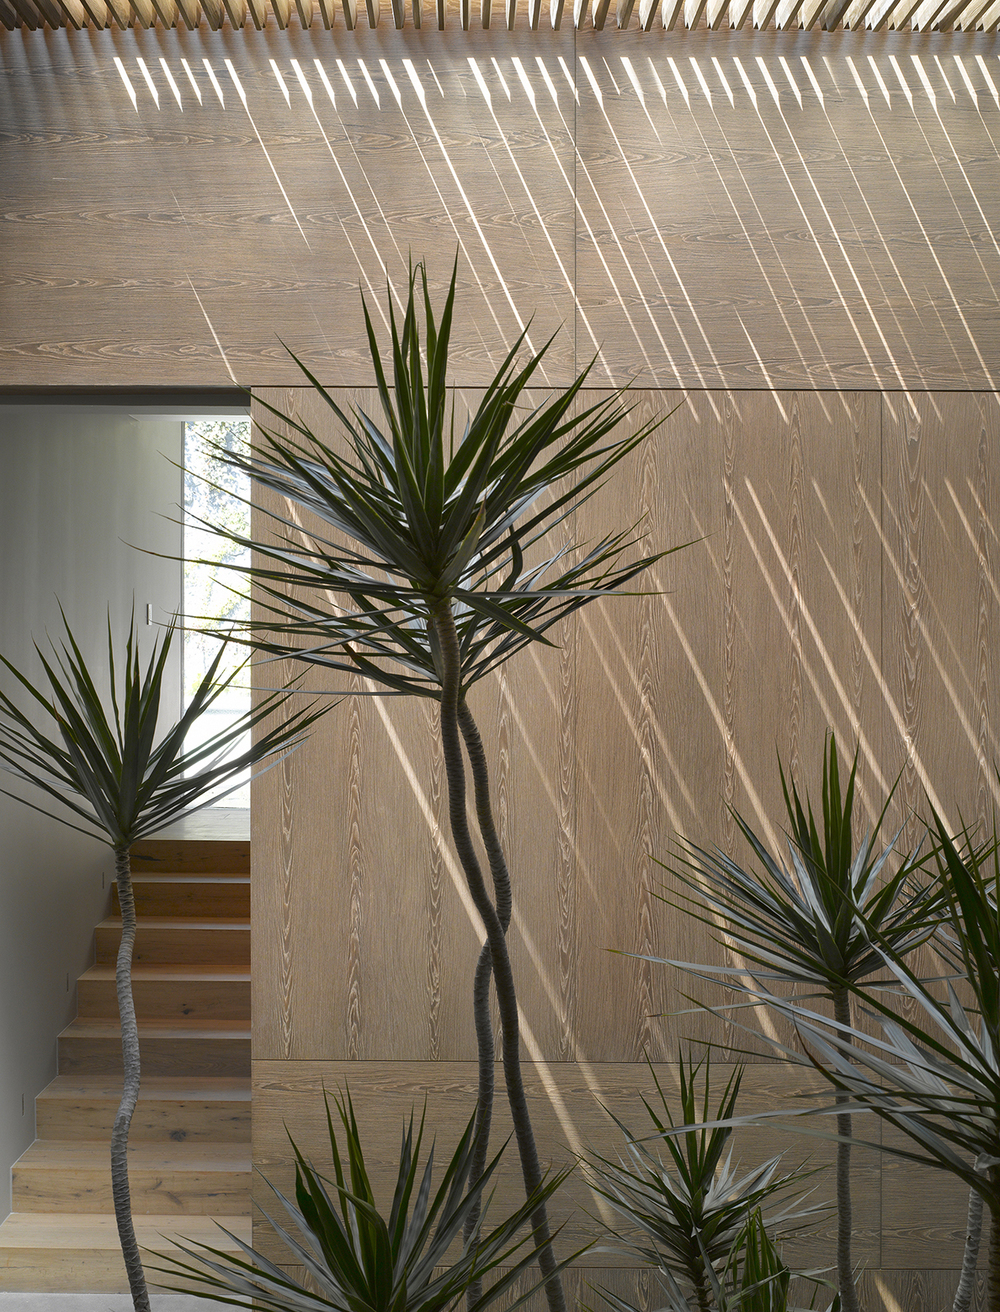 54d416d8e58ece20b6000046_the-barrancas-house-ezequielfarca-architecture-design_casa_barrancas_ezequielfarca_16.jpg